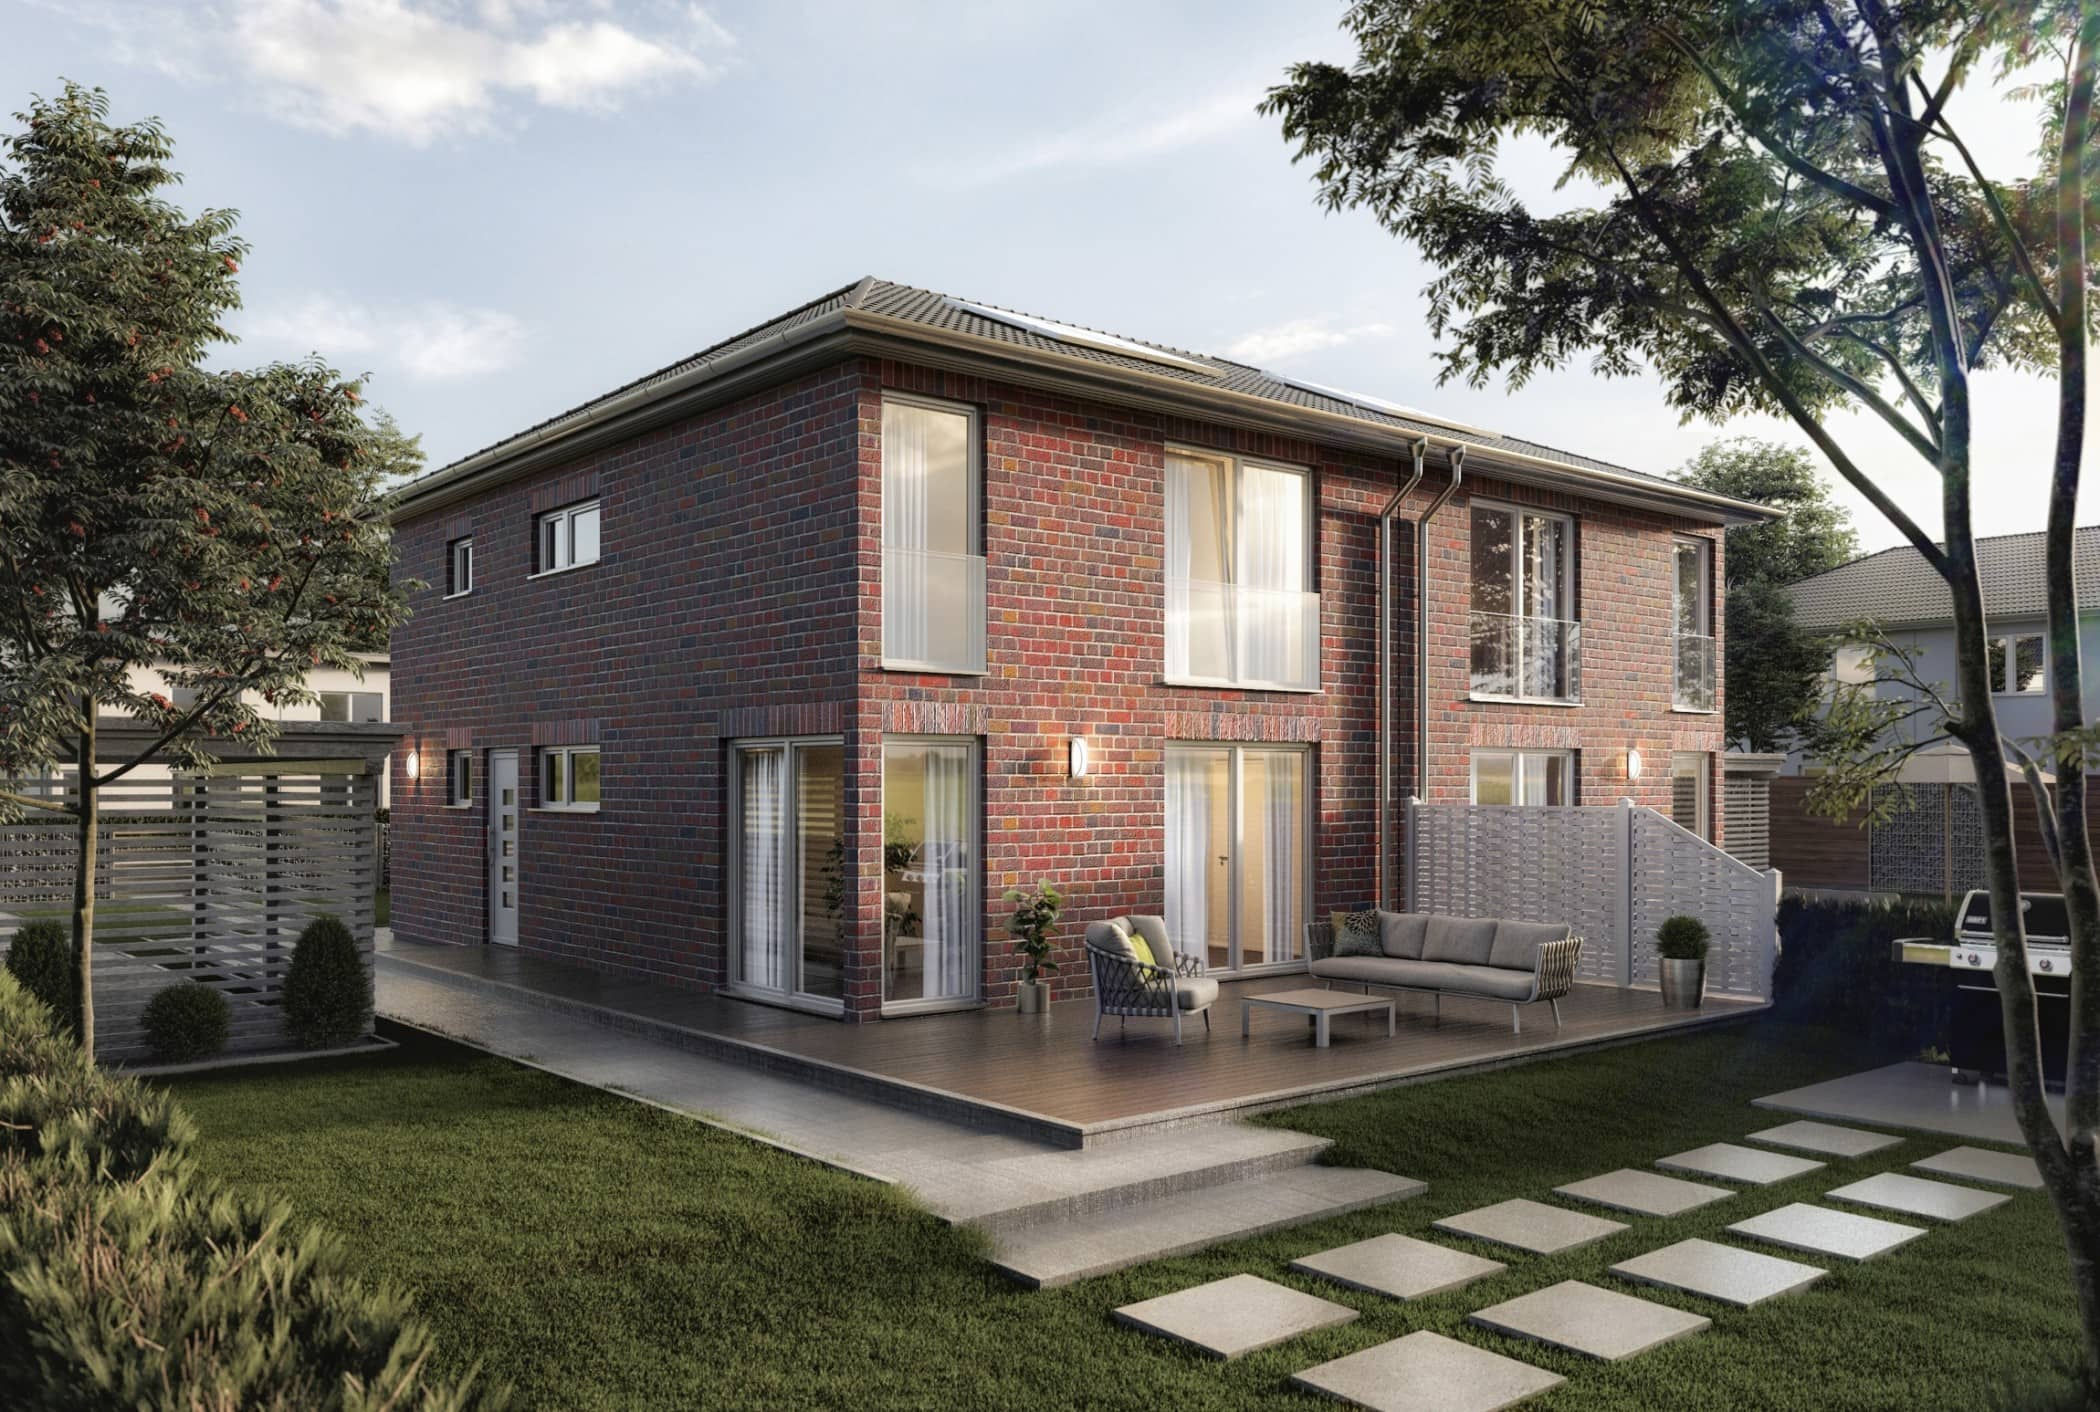 Modernes Doppelhaus schluesselfertig bauen mit Walmdach & Klinker Fassade - Doppelhaushälfte massiv bauen Ideen Town Country Haus AURA 136 KLINKER Hektiek Bunt - HausbauDirekt.de